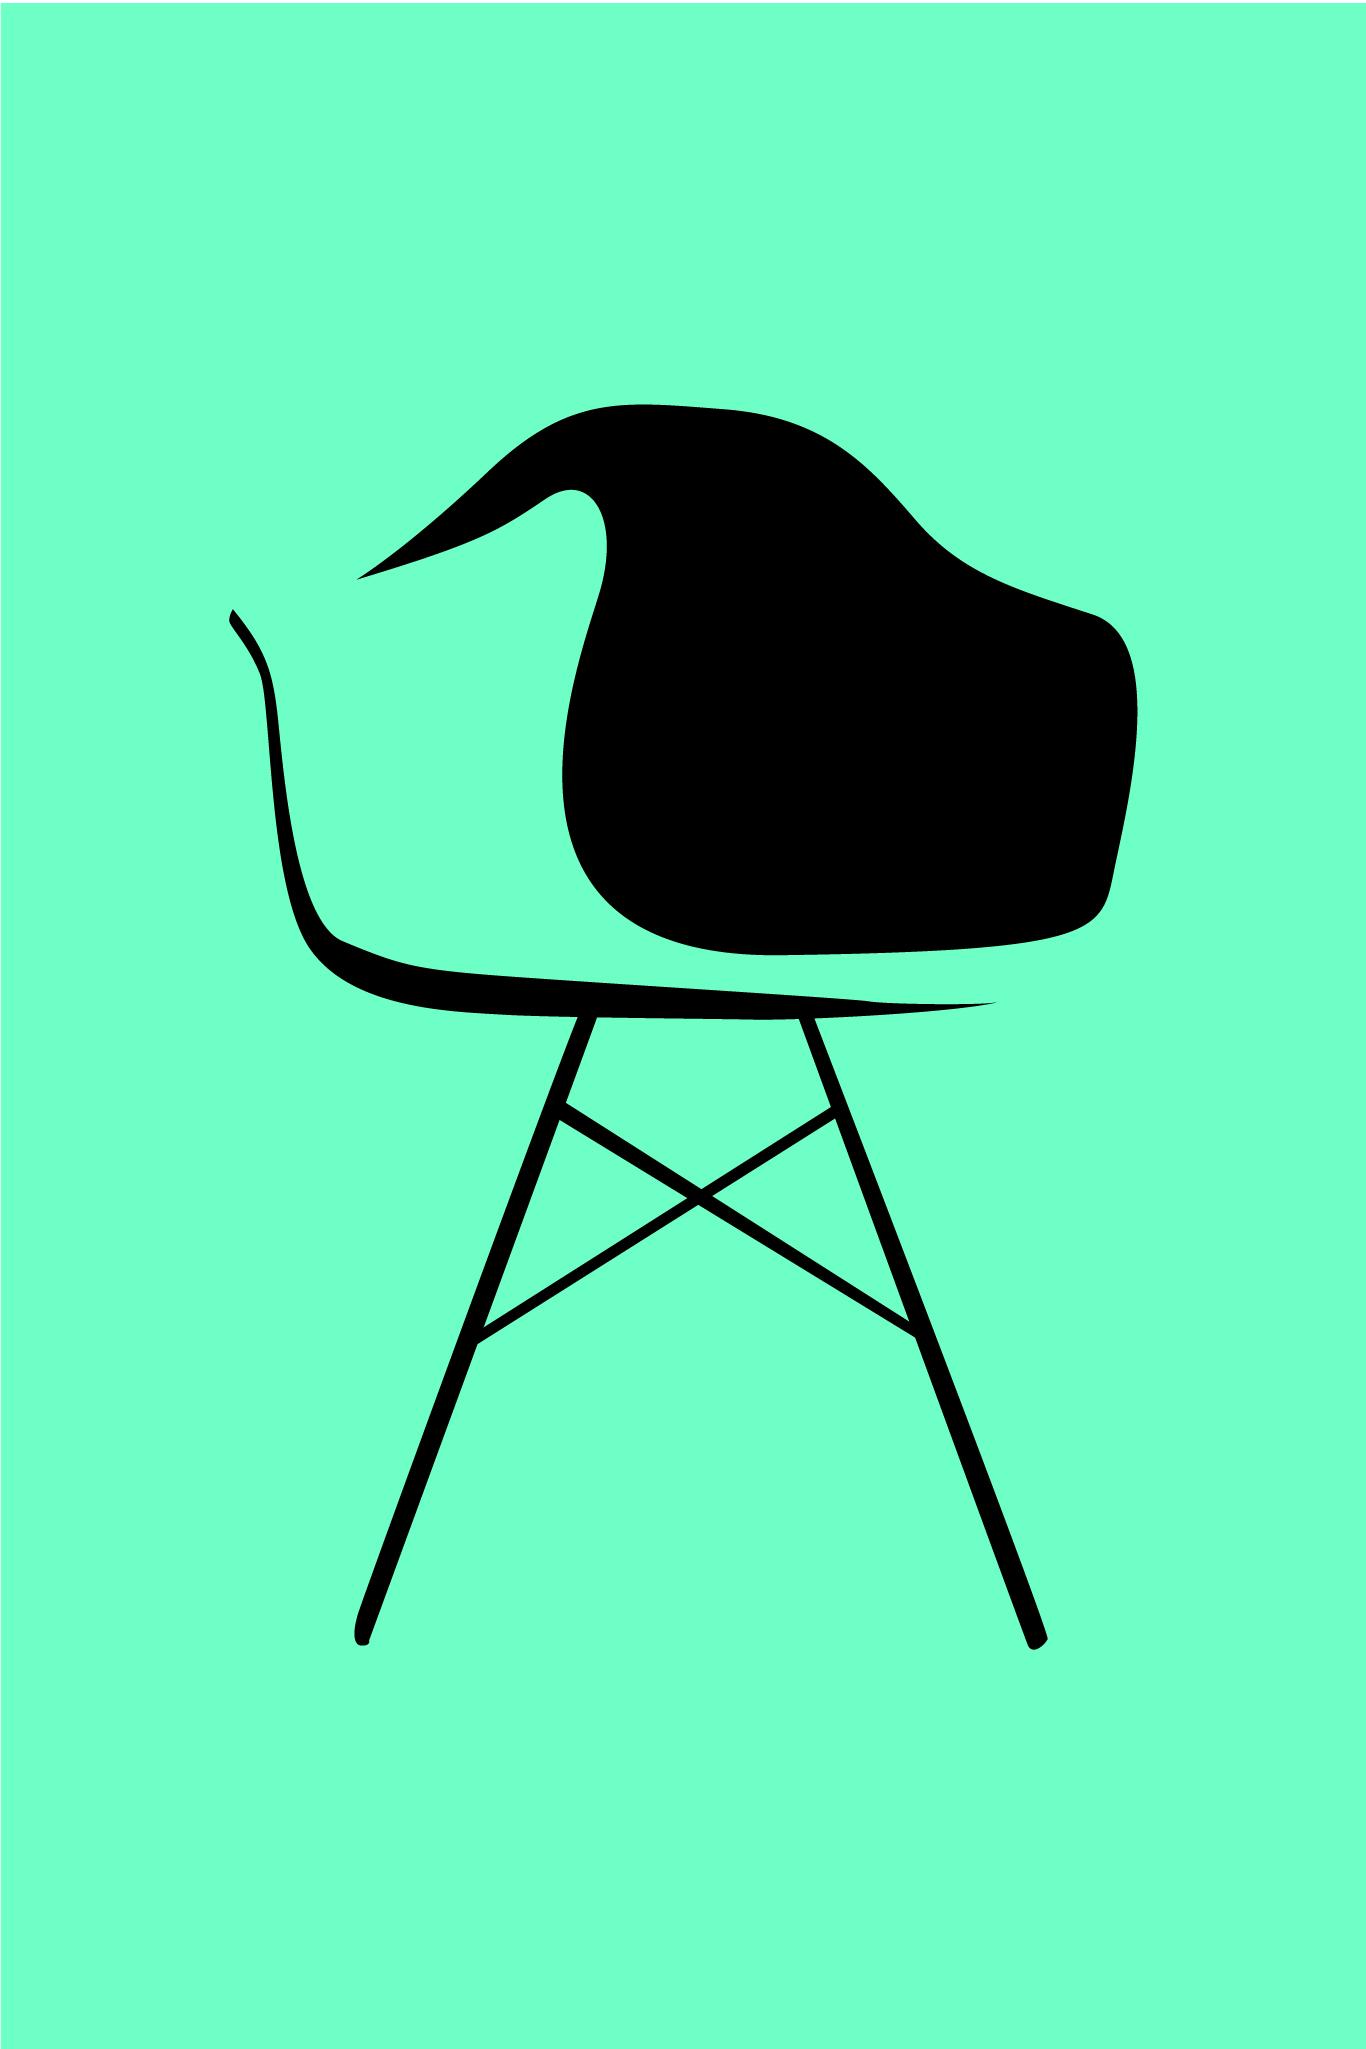 Diningchair-02.jpg